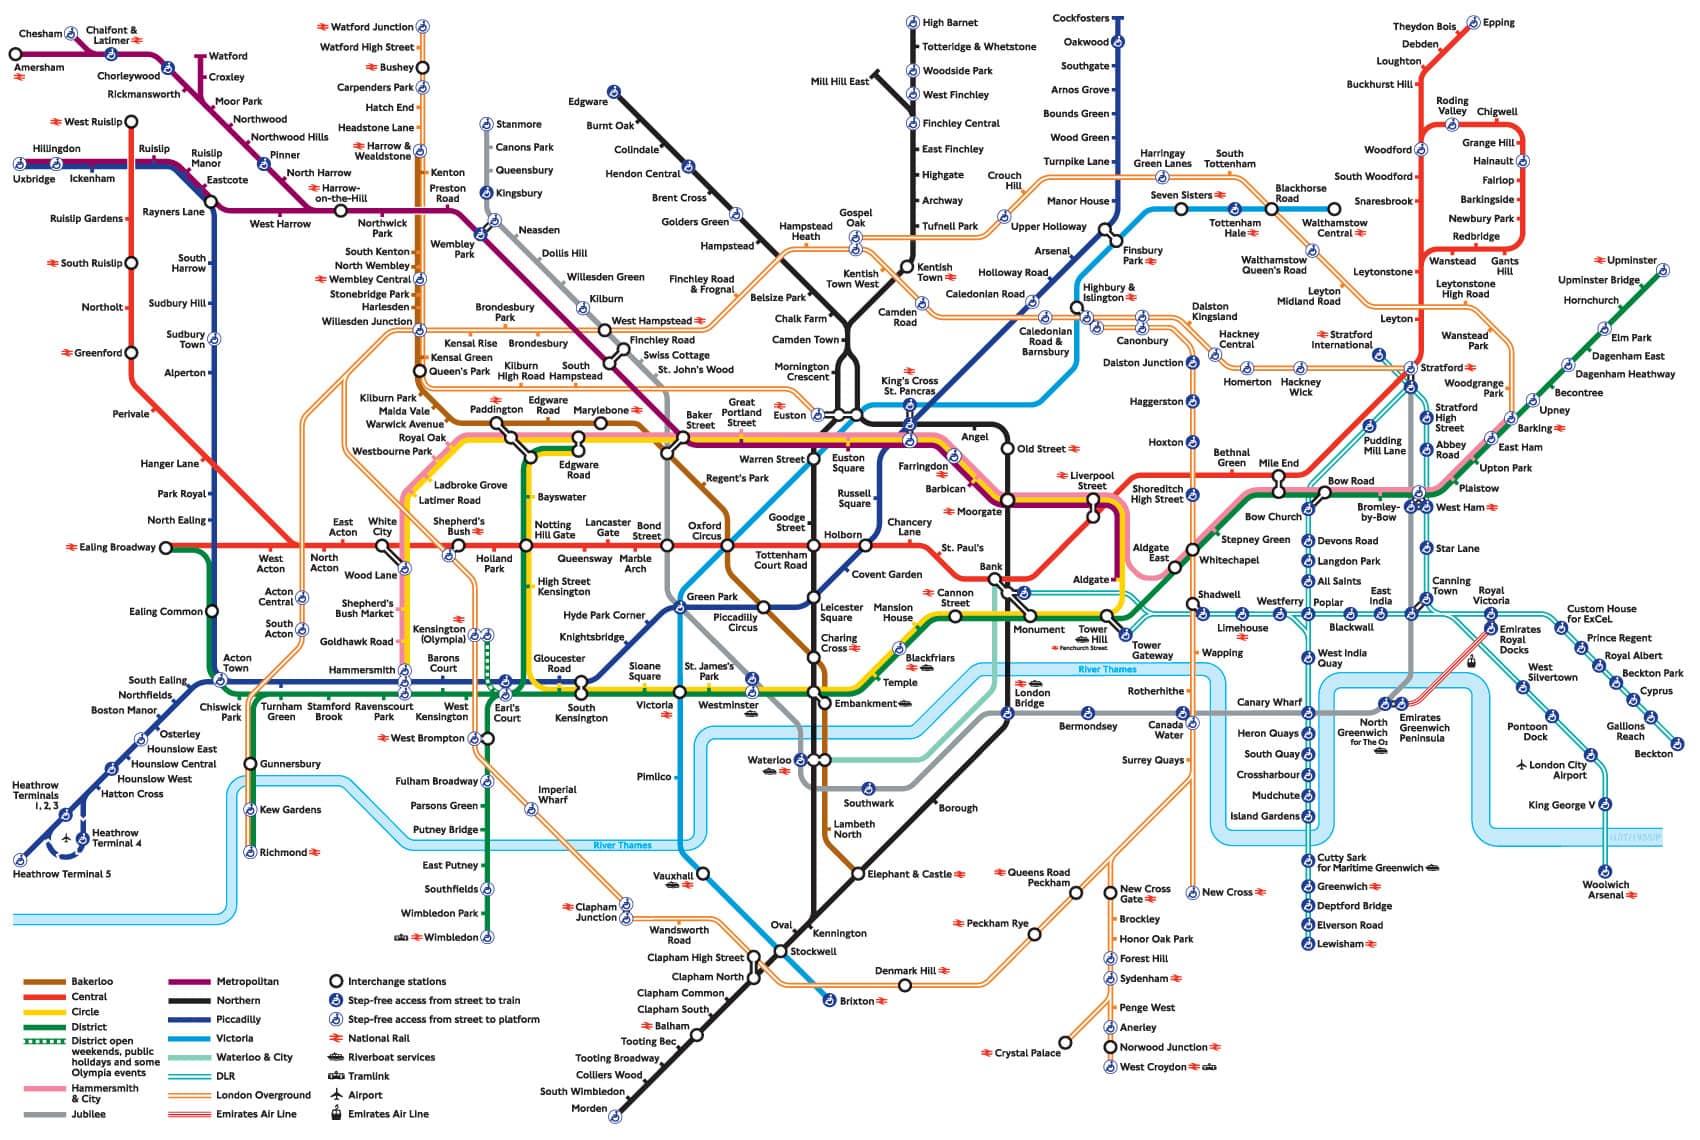 MAPA METRO LONDON